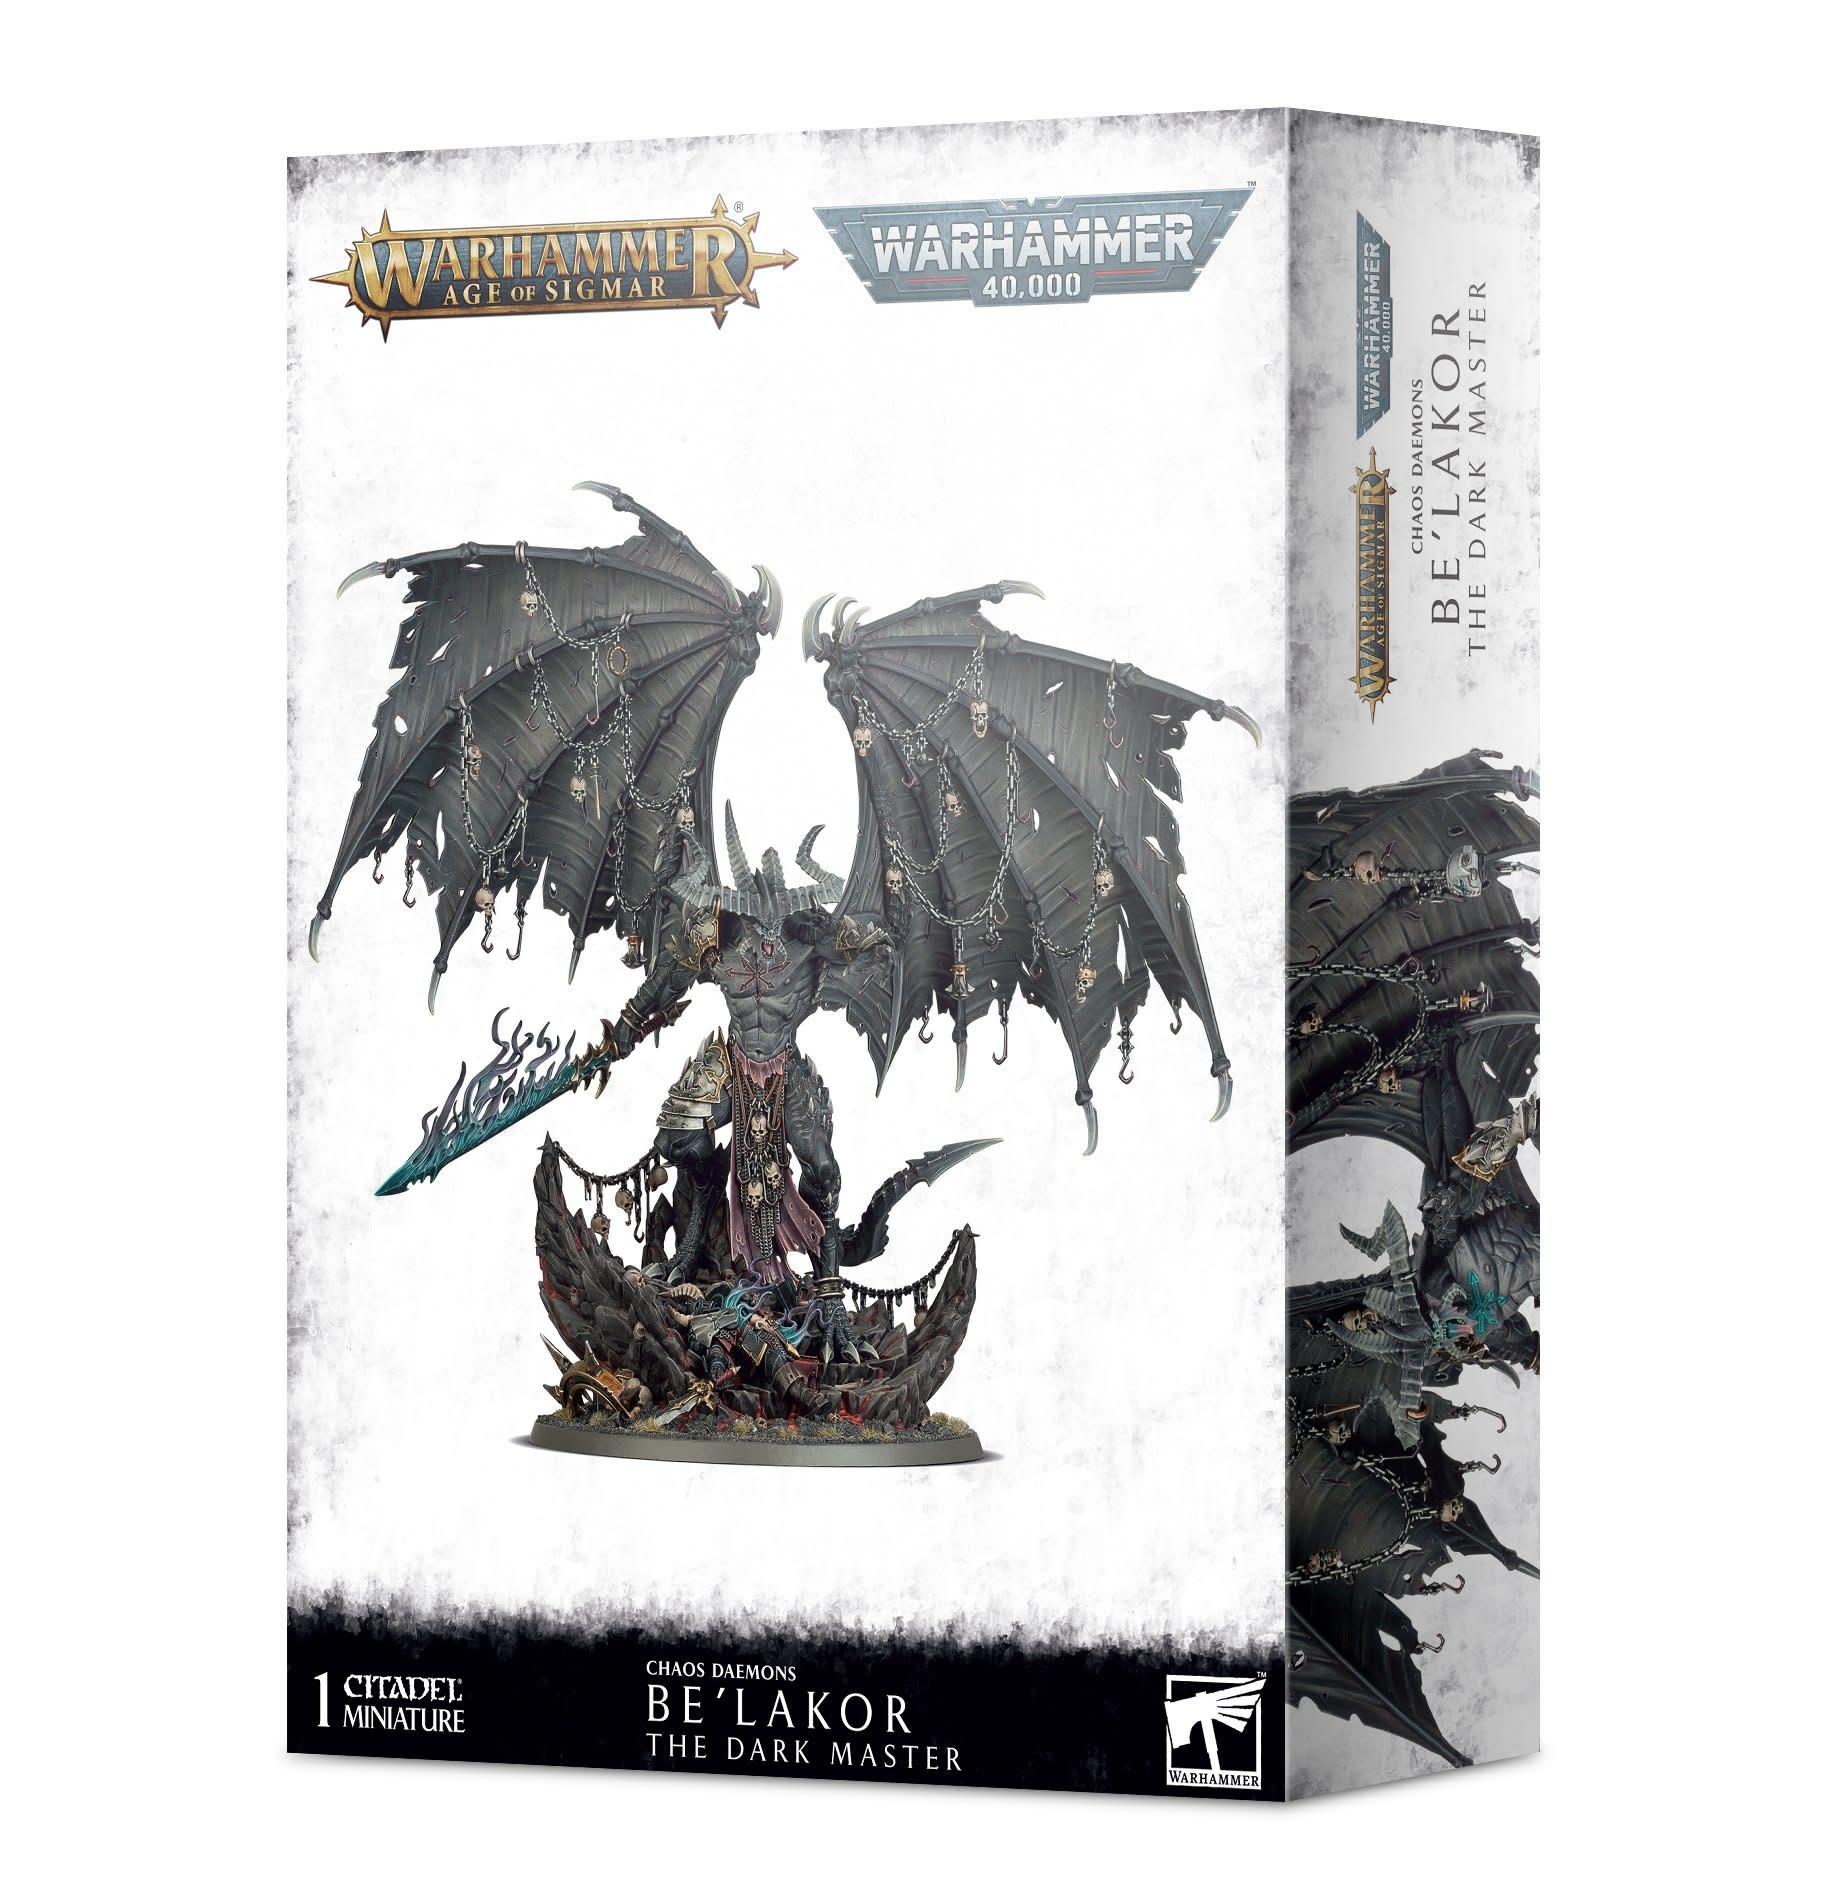 Games-Workshop Be'Lakor, The Dark Master